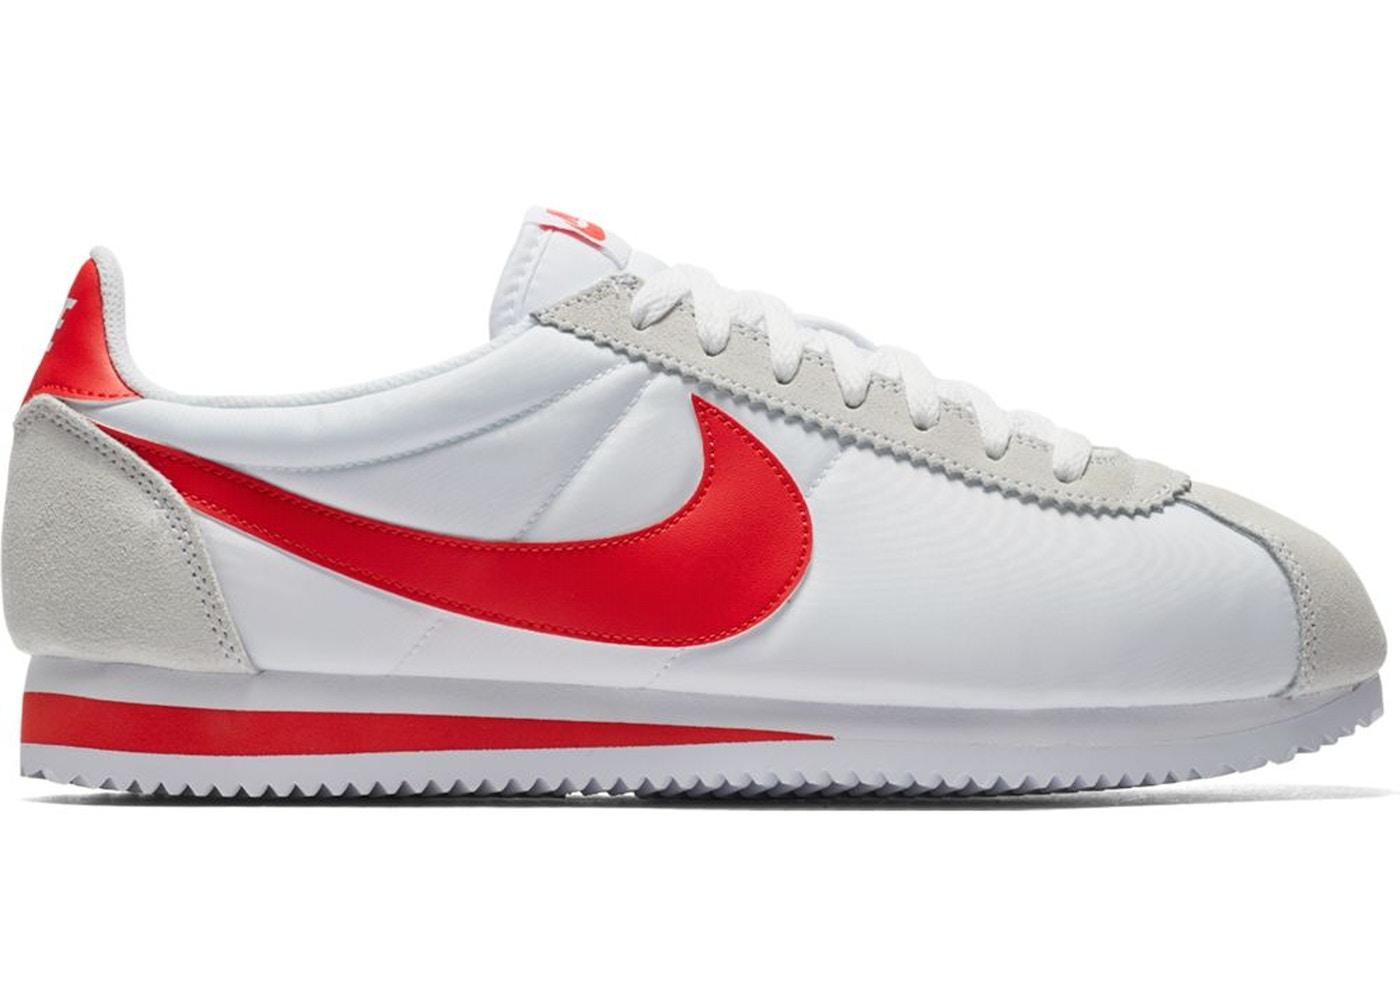 Nike Classic Cortez Nylon White Habanero Red